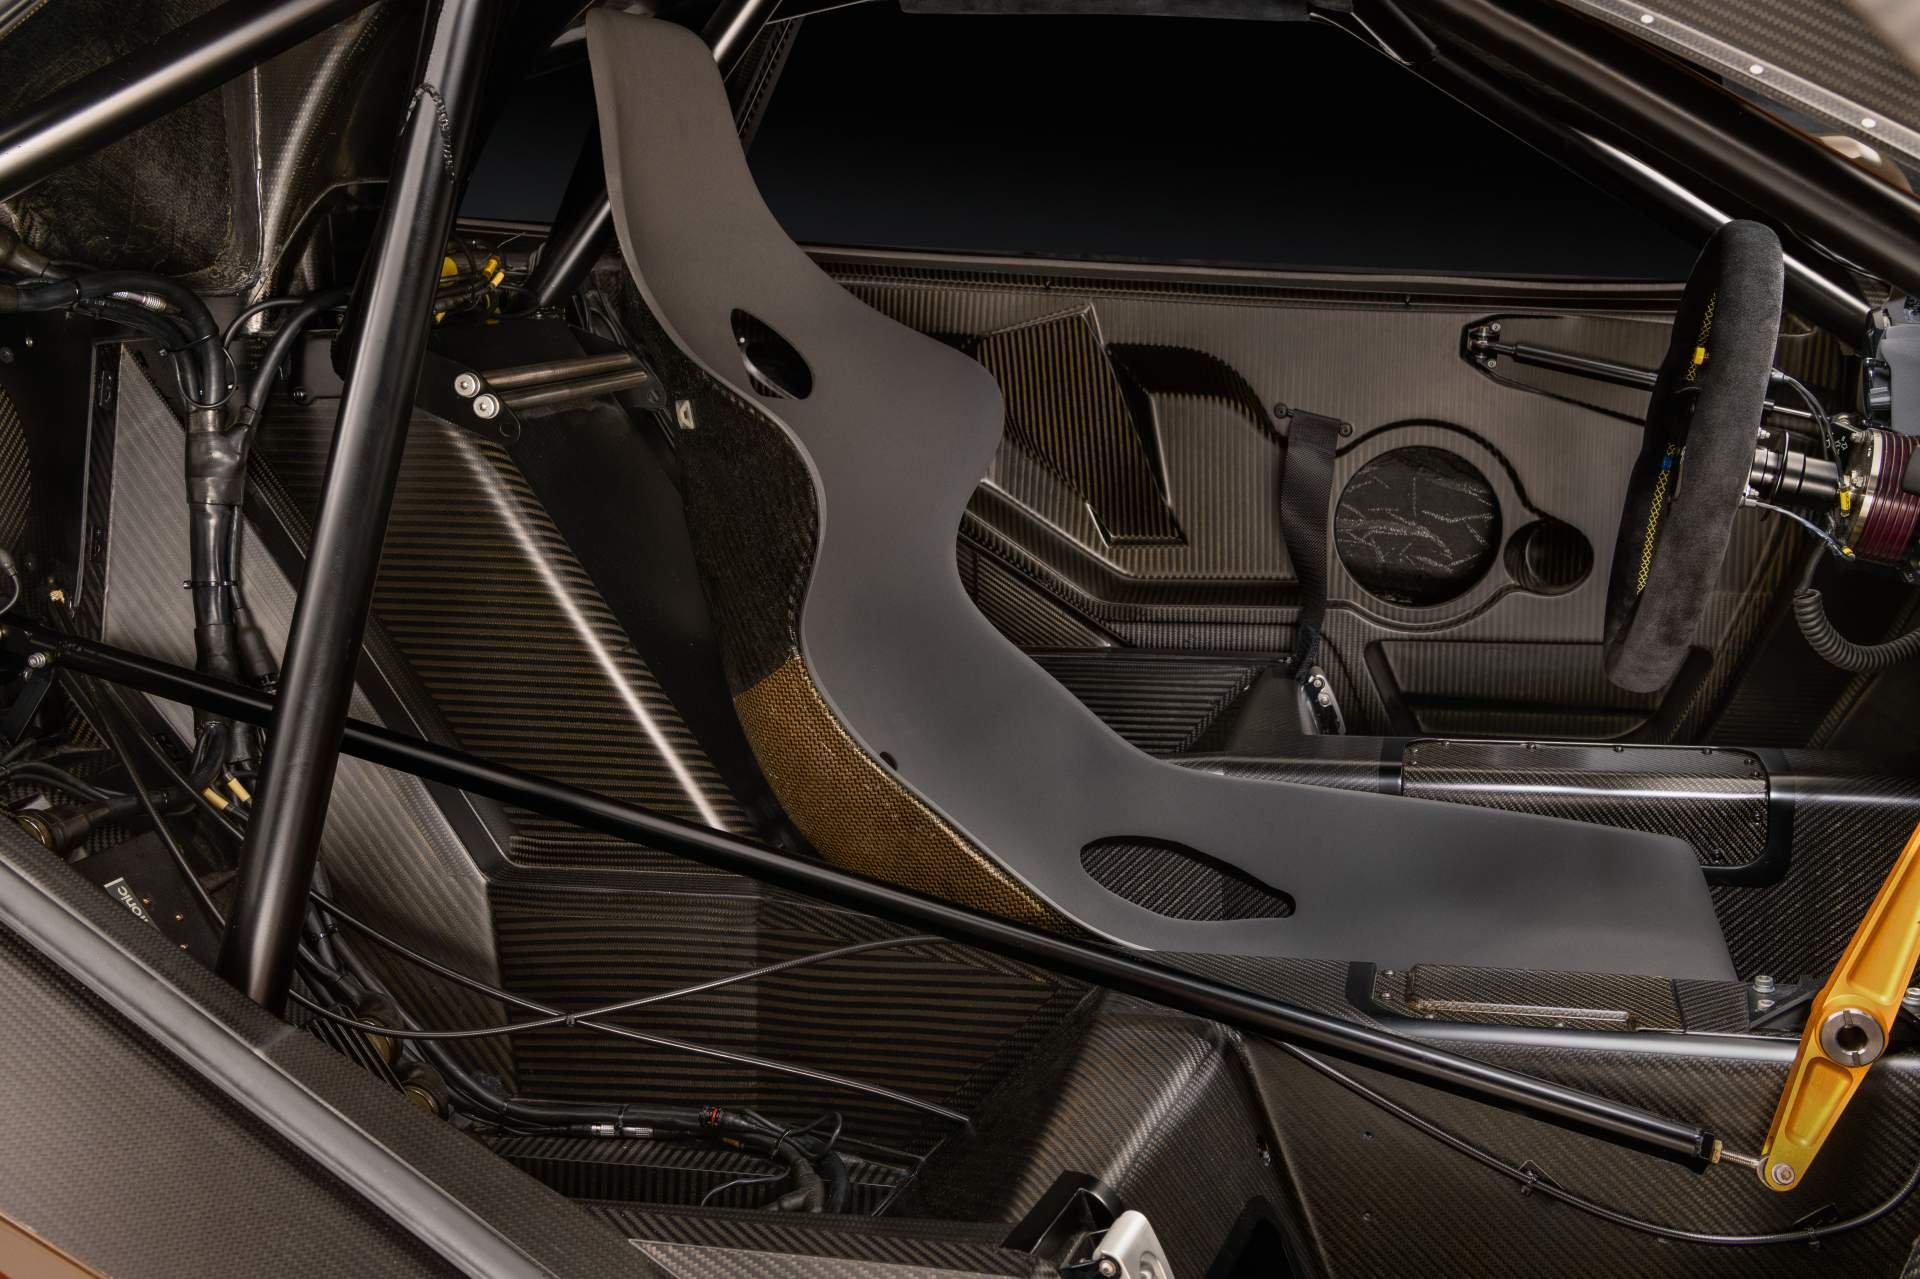 McLaren F1 GTR Longtail 25R restored by MSO (12)